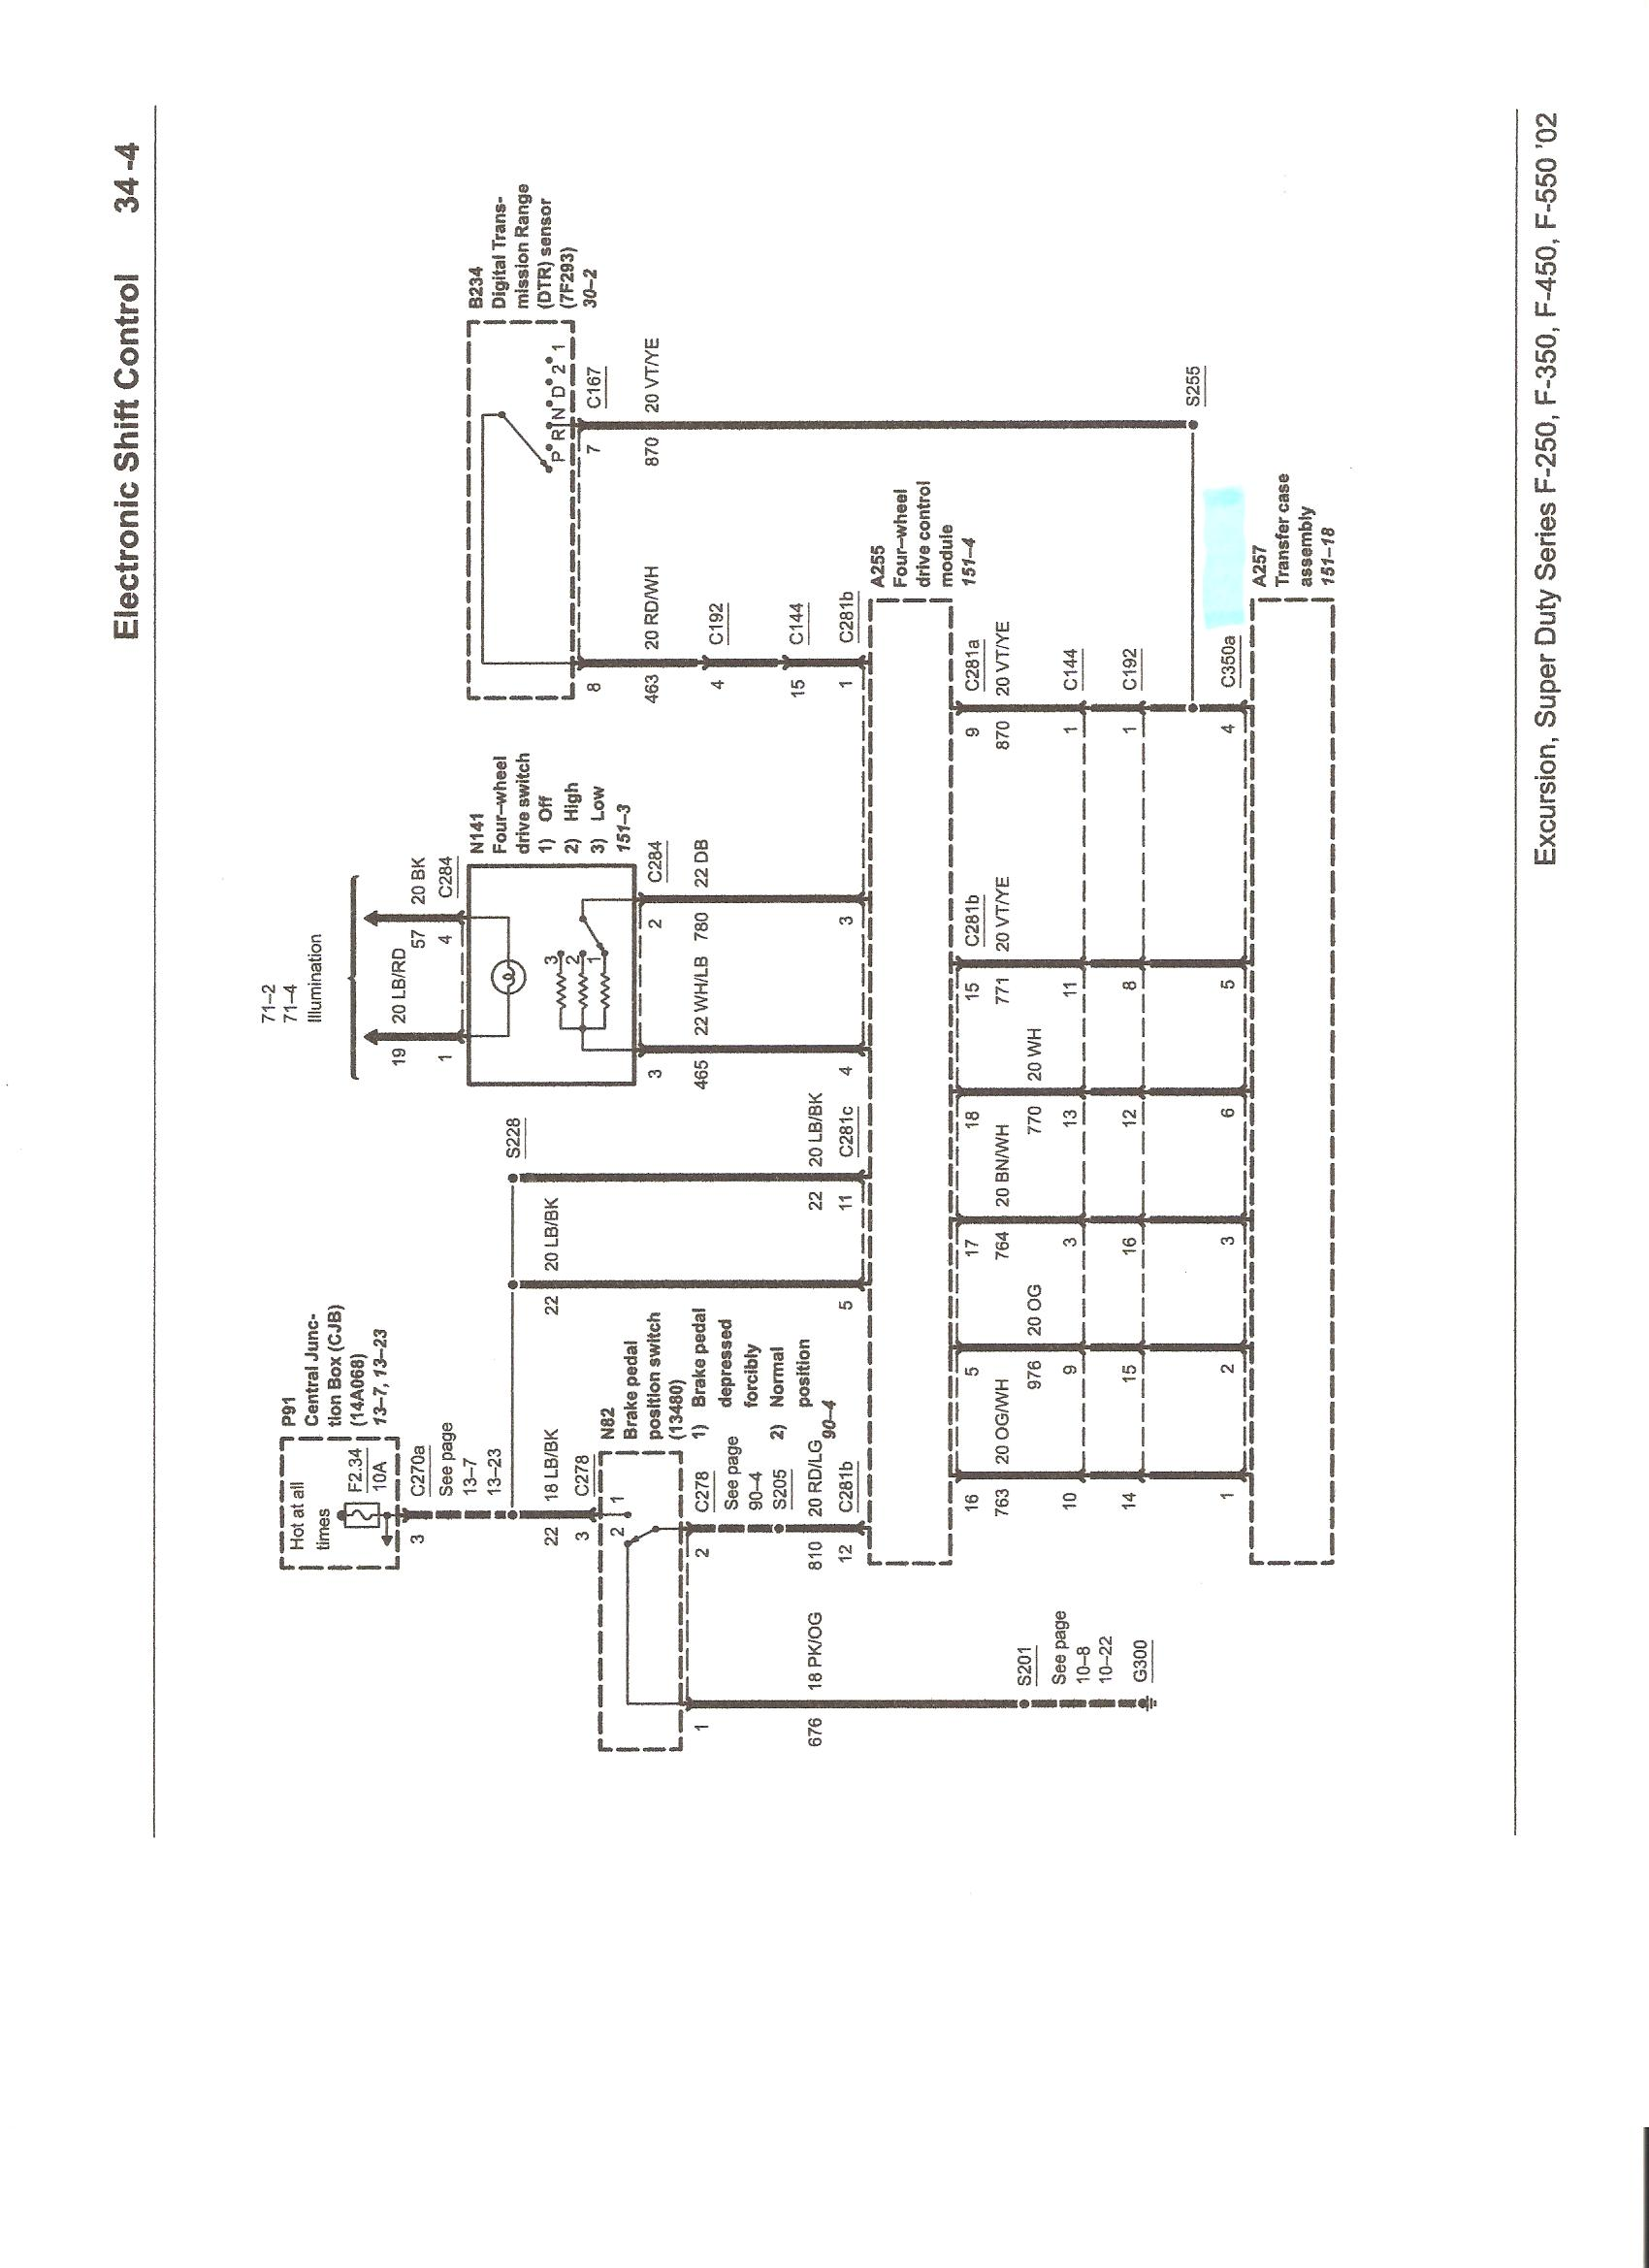 02 f250 super duty transfer case np273 electric shift has several graphic graphic graphic graphic